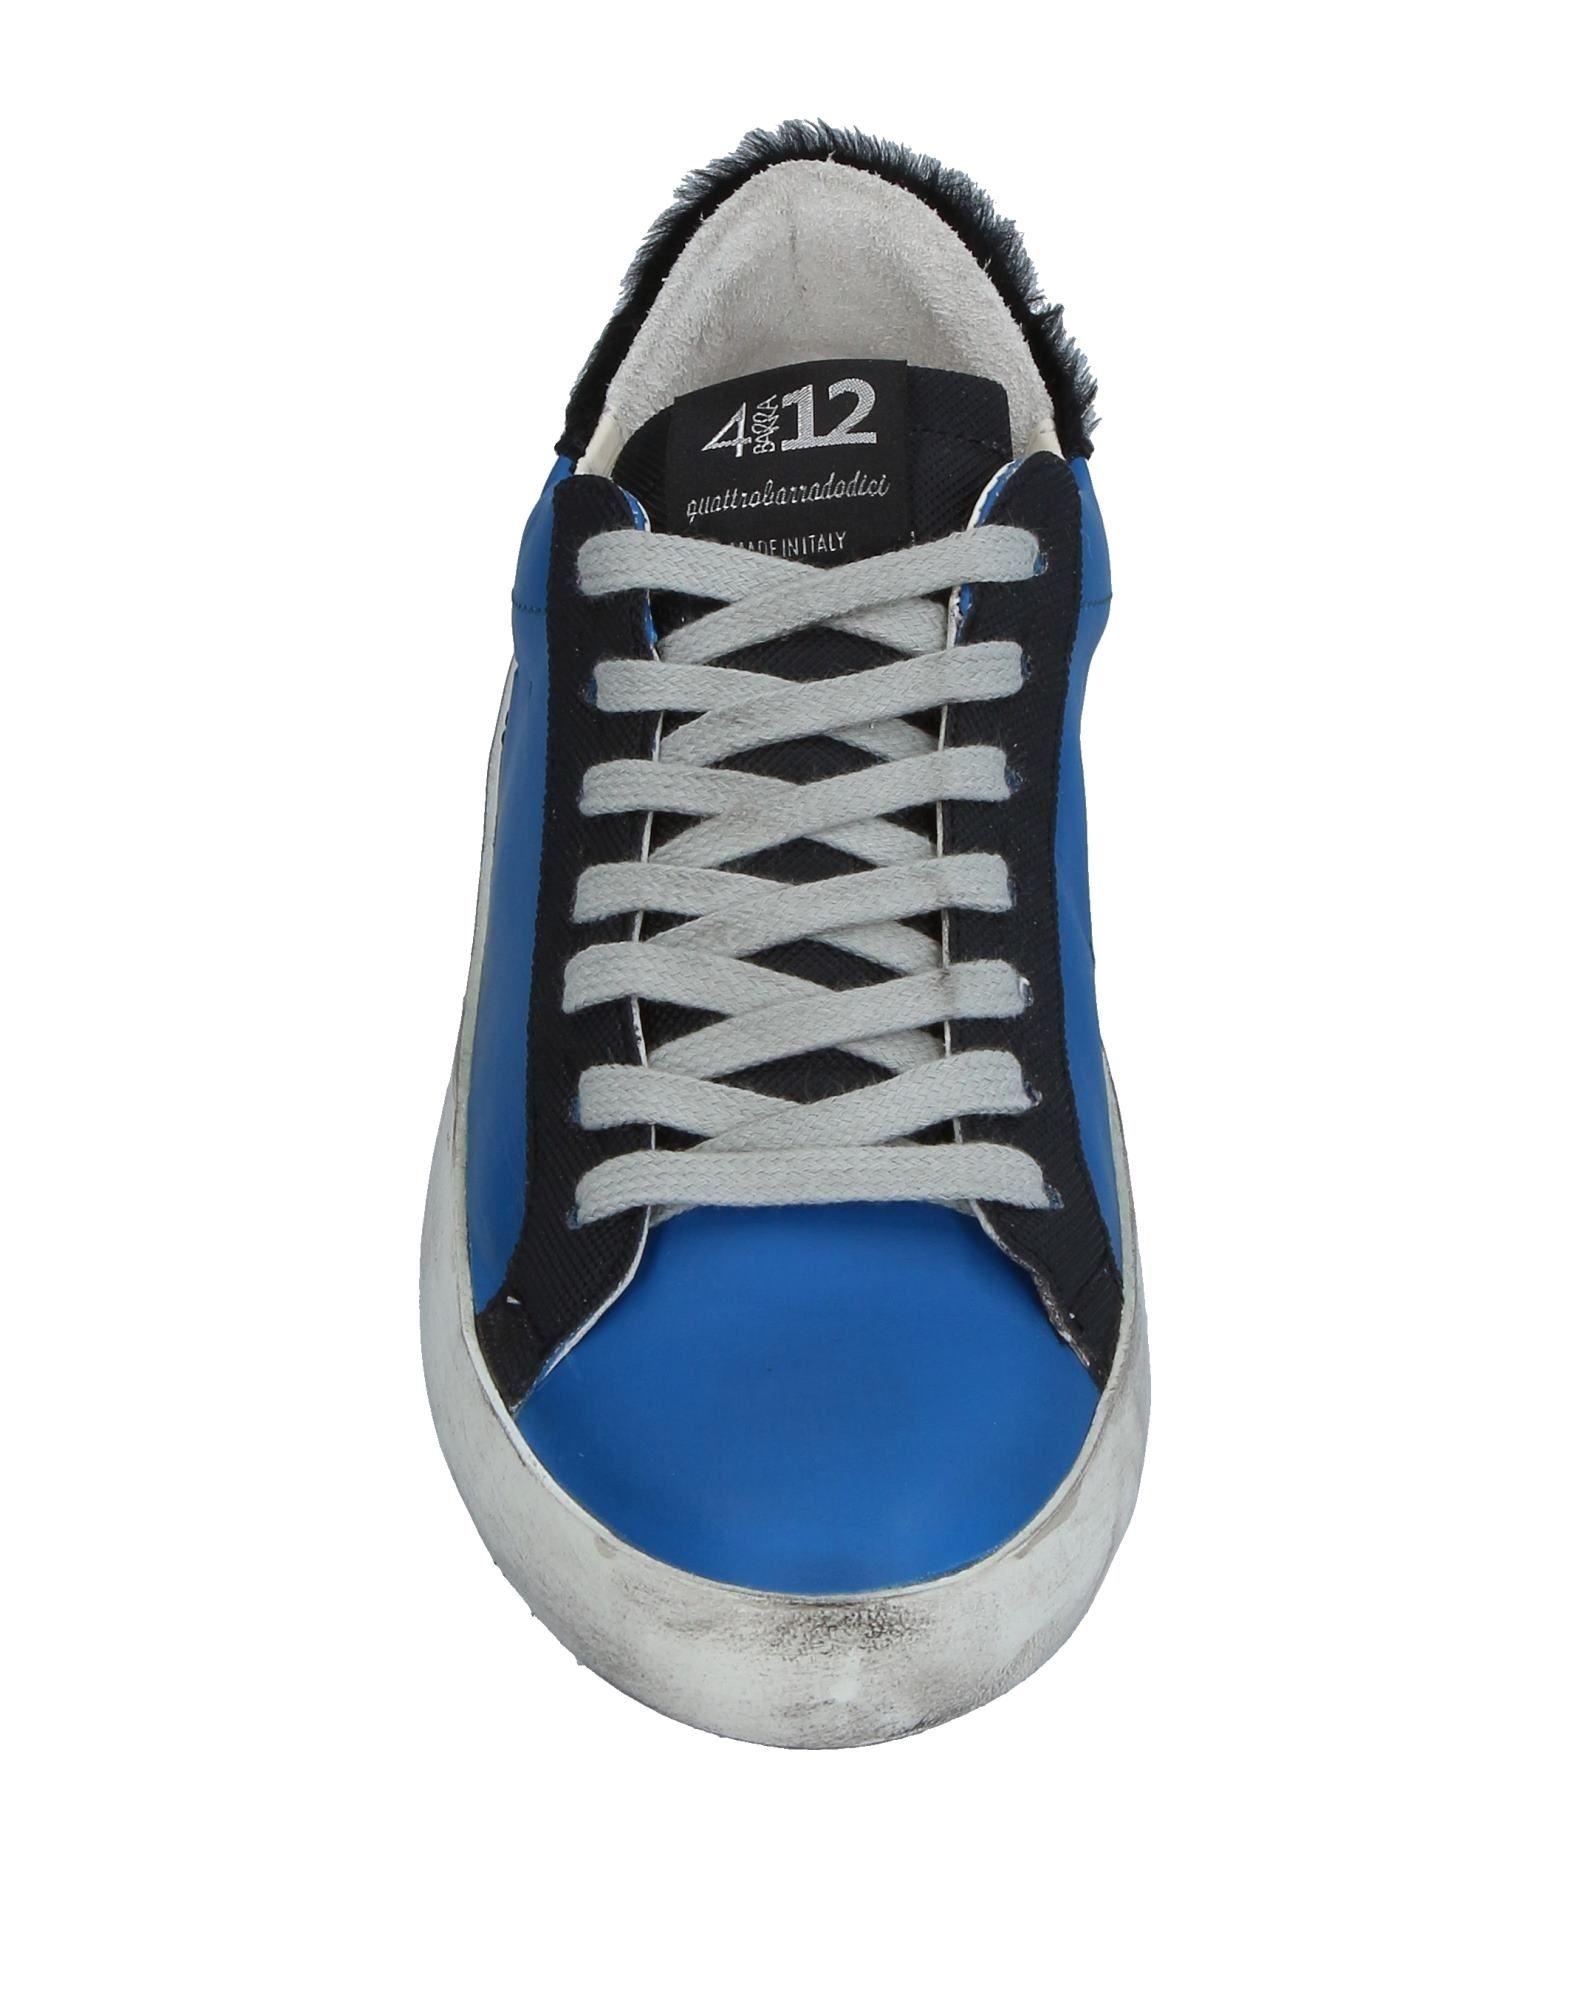 Quattrobarradodici Gute Sneakers Damen  11266052RD Gute Quattrobarradodici Qualität beliebte Schuhe 6608b4